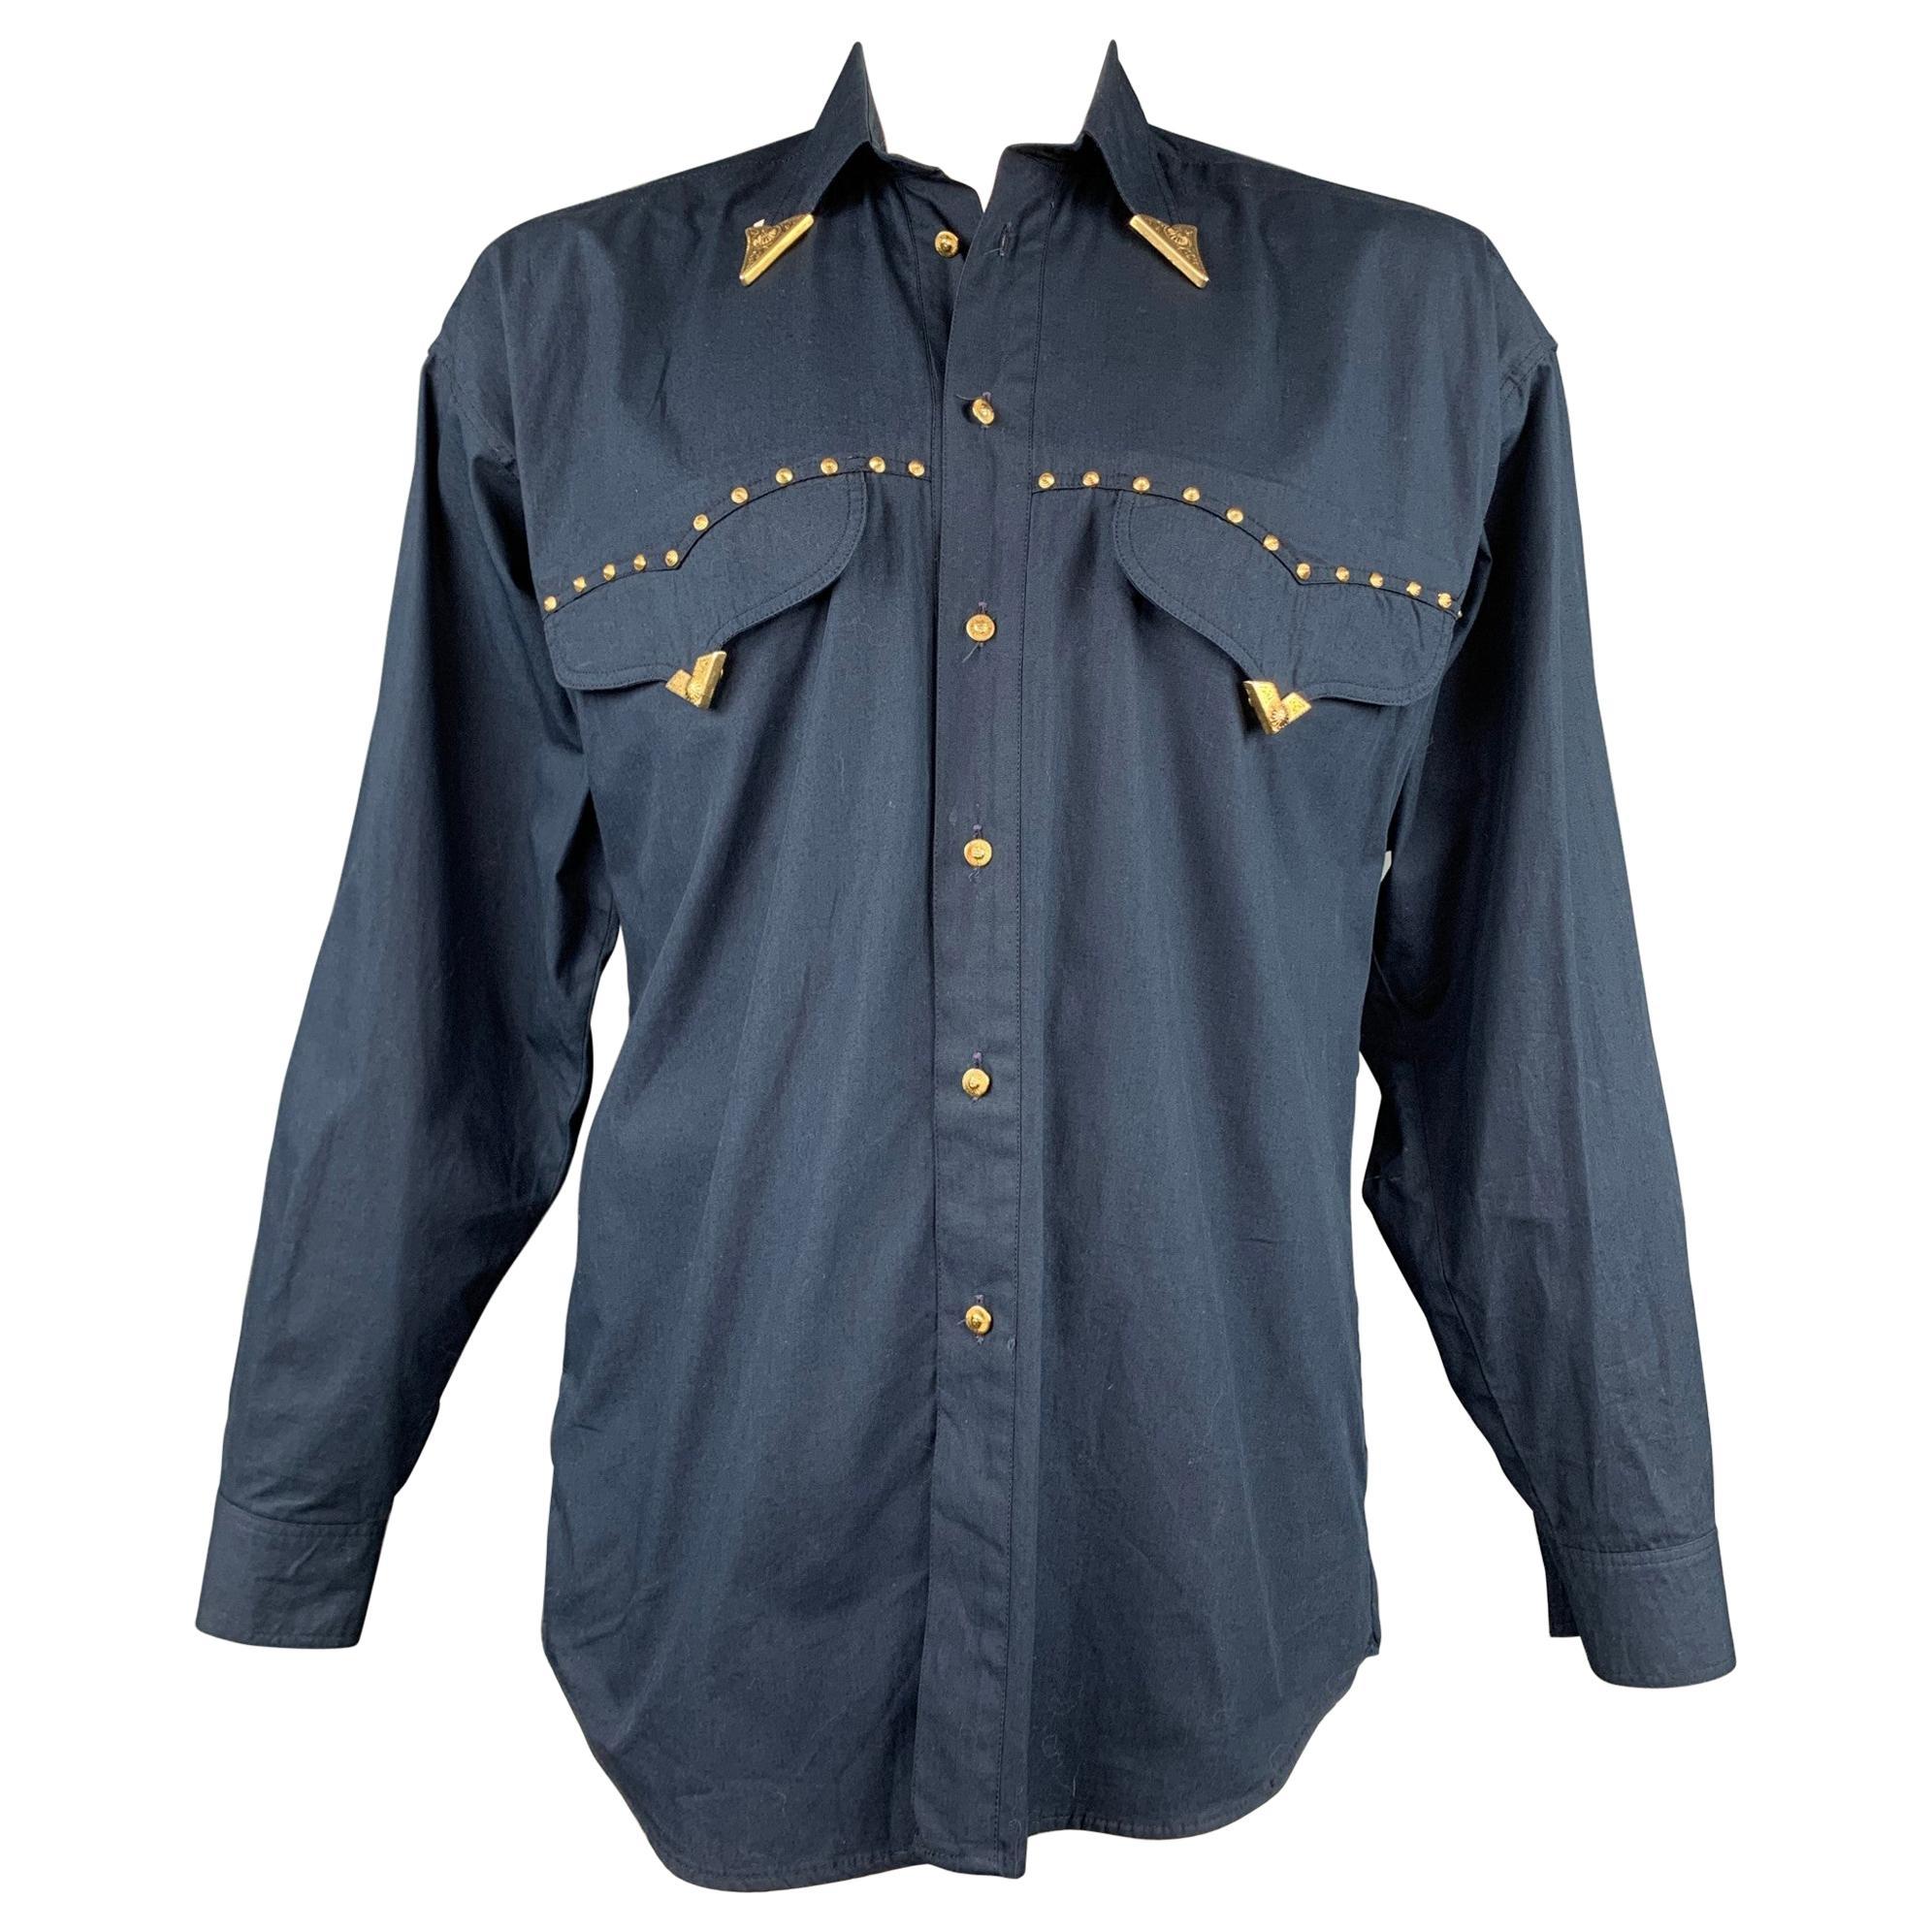 Vintage VERSACE JEANS COUTURE Size M Navy Studded Cotton Cowboy Oversized Shirt